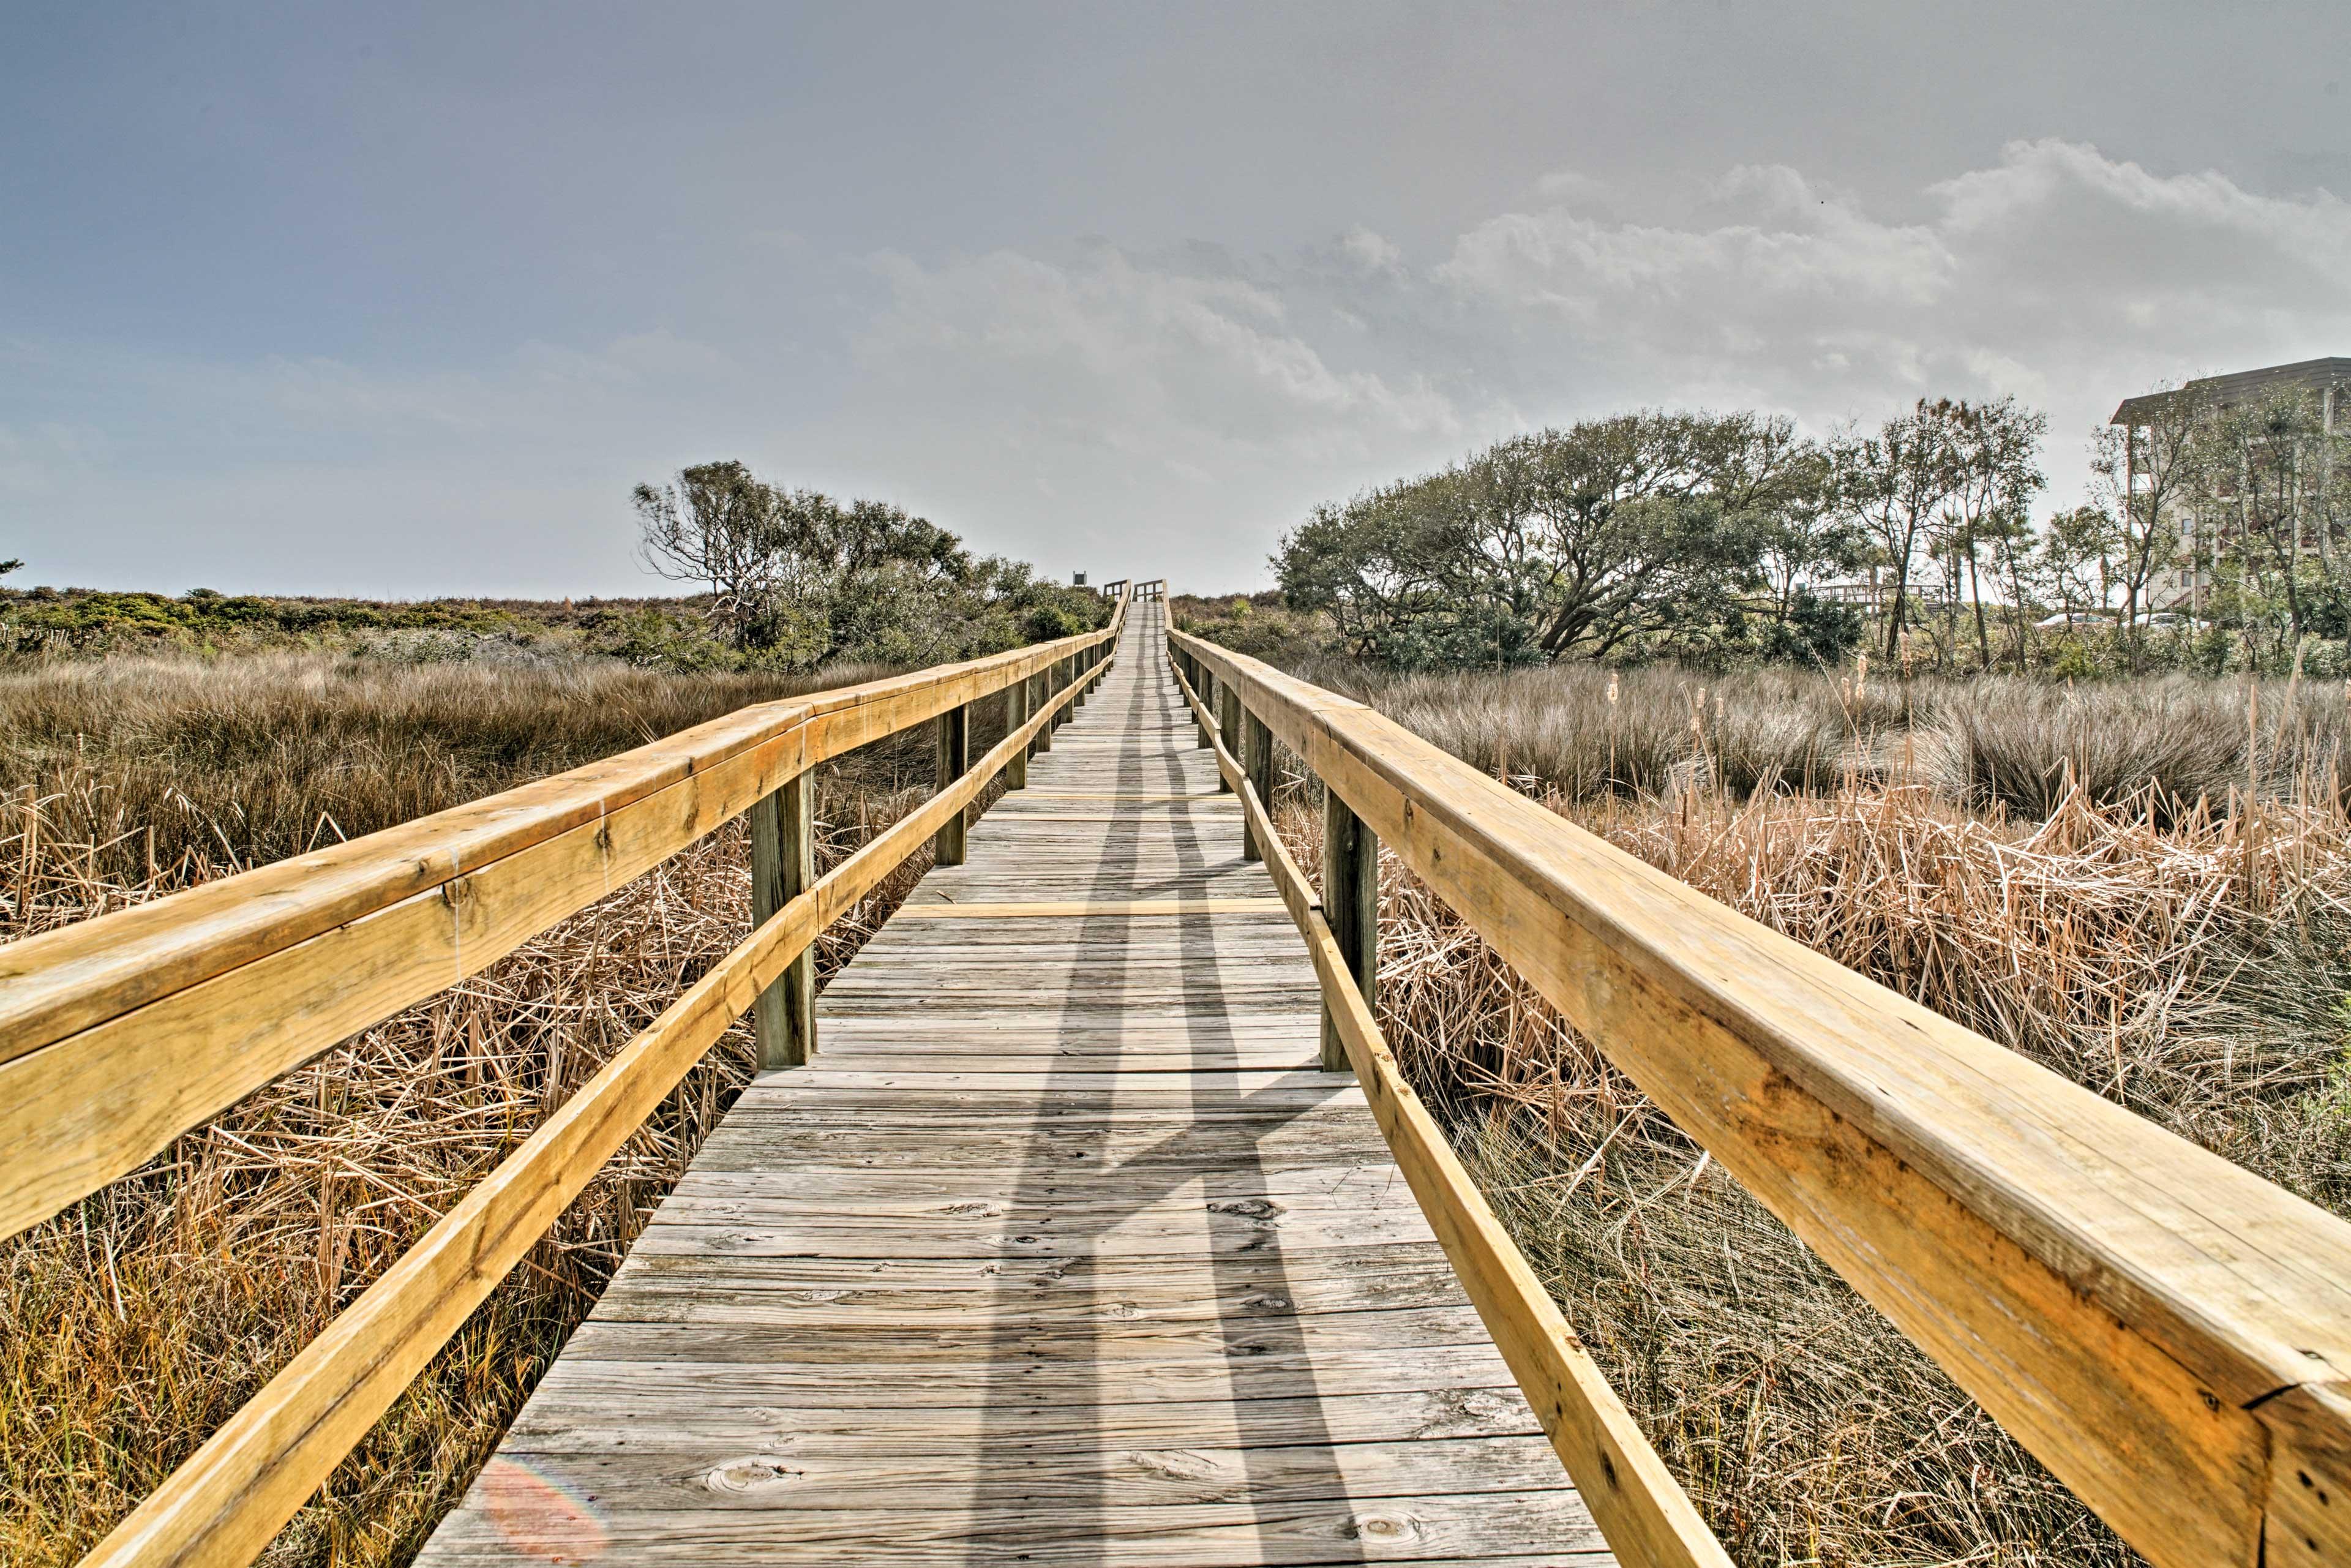 Take a stroll down the boardwalk to the coast of Hilton Head Island Beach!